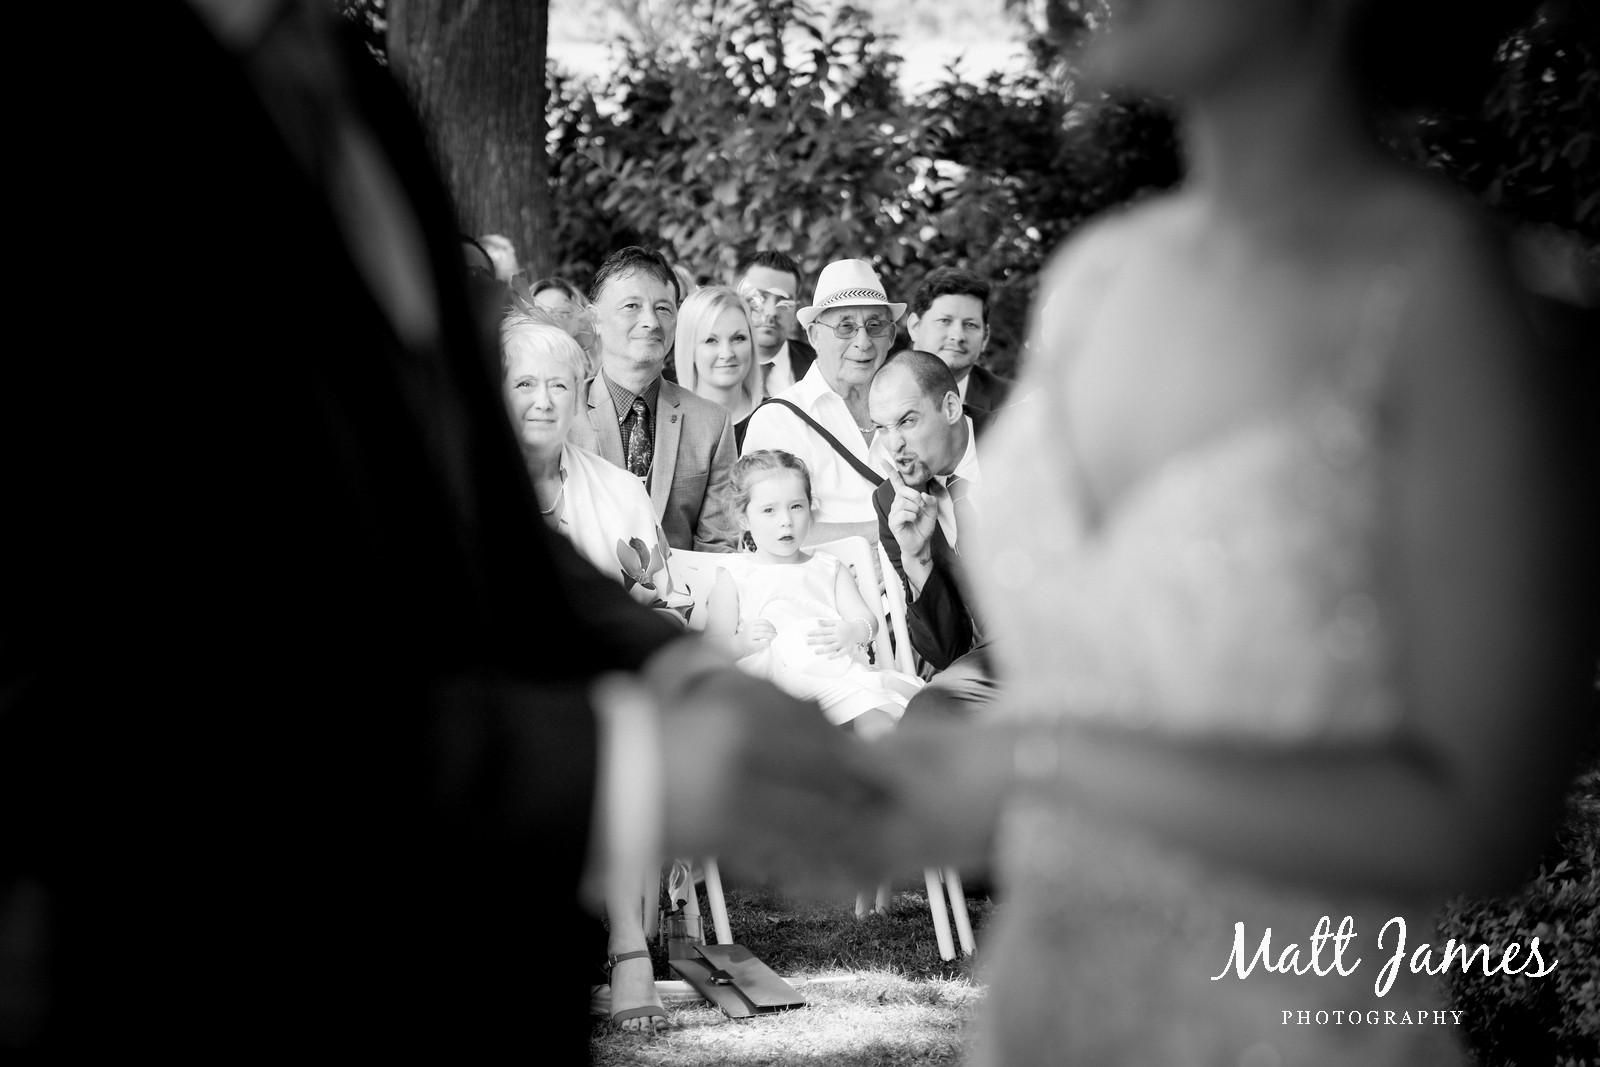 Matt-James-Photography-Wedding-photographer30